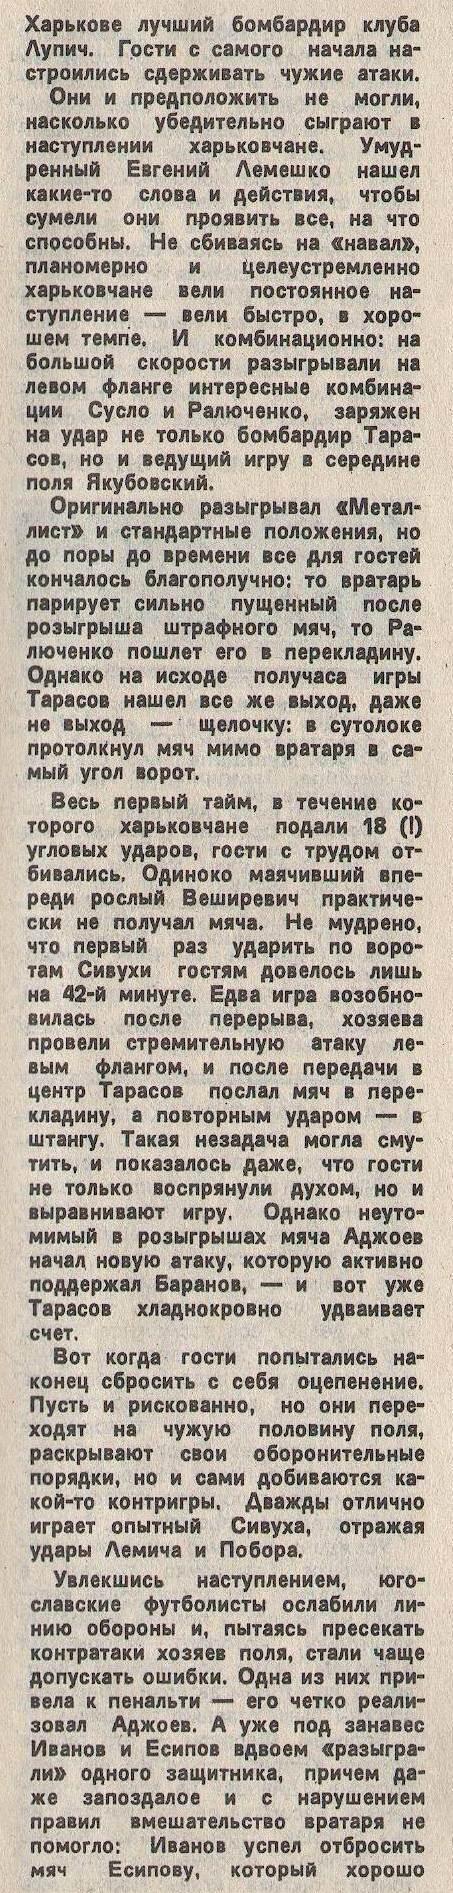 [Изображение: 1988-10-UEFA_MKh-Boracz2.jpg]